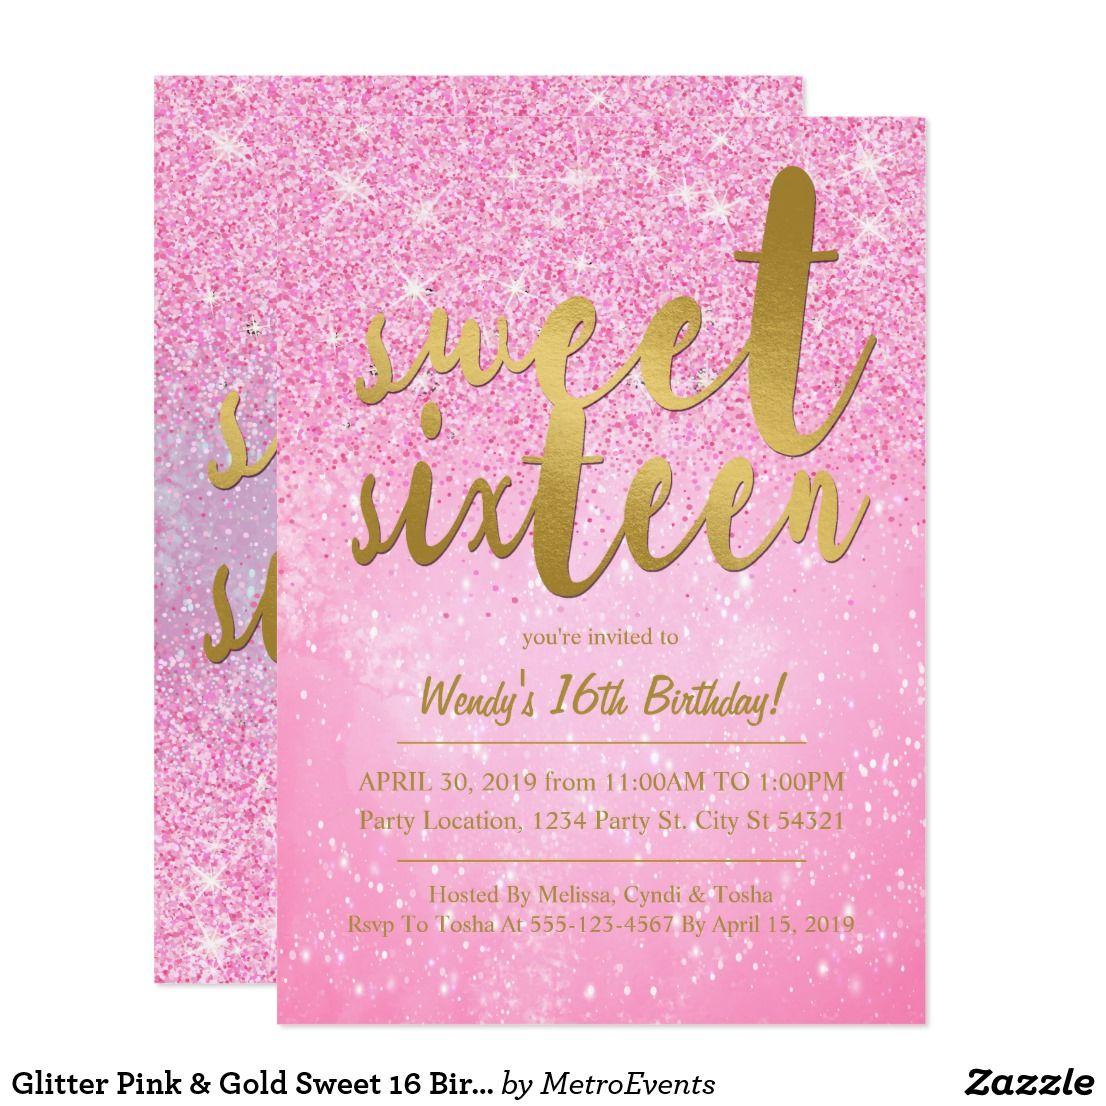 Glitter Pink & Gold Sweet 16 Birthday Invitations Glitter Pink ...